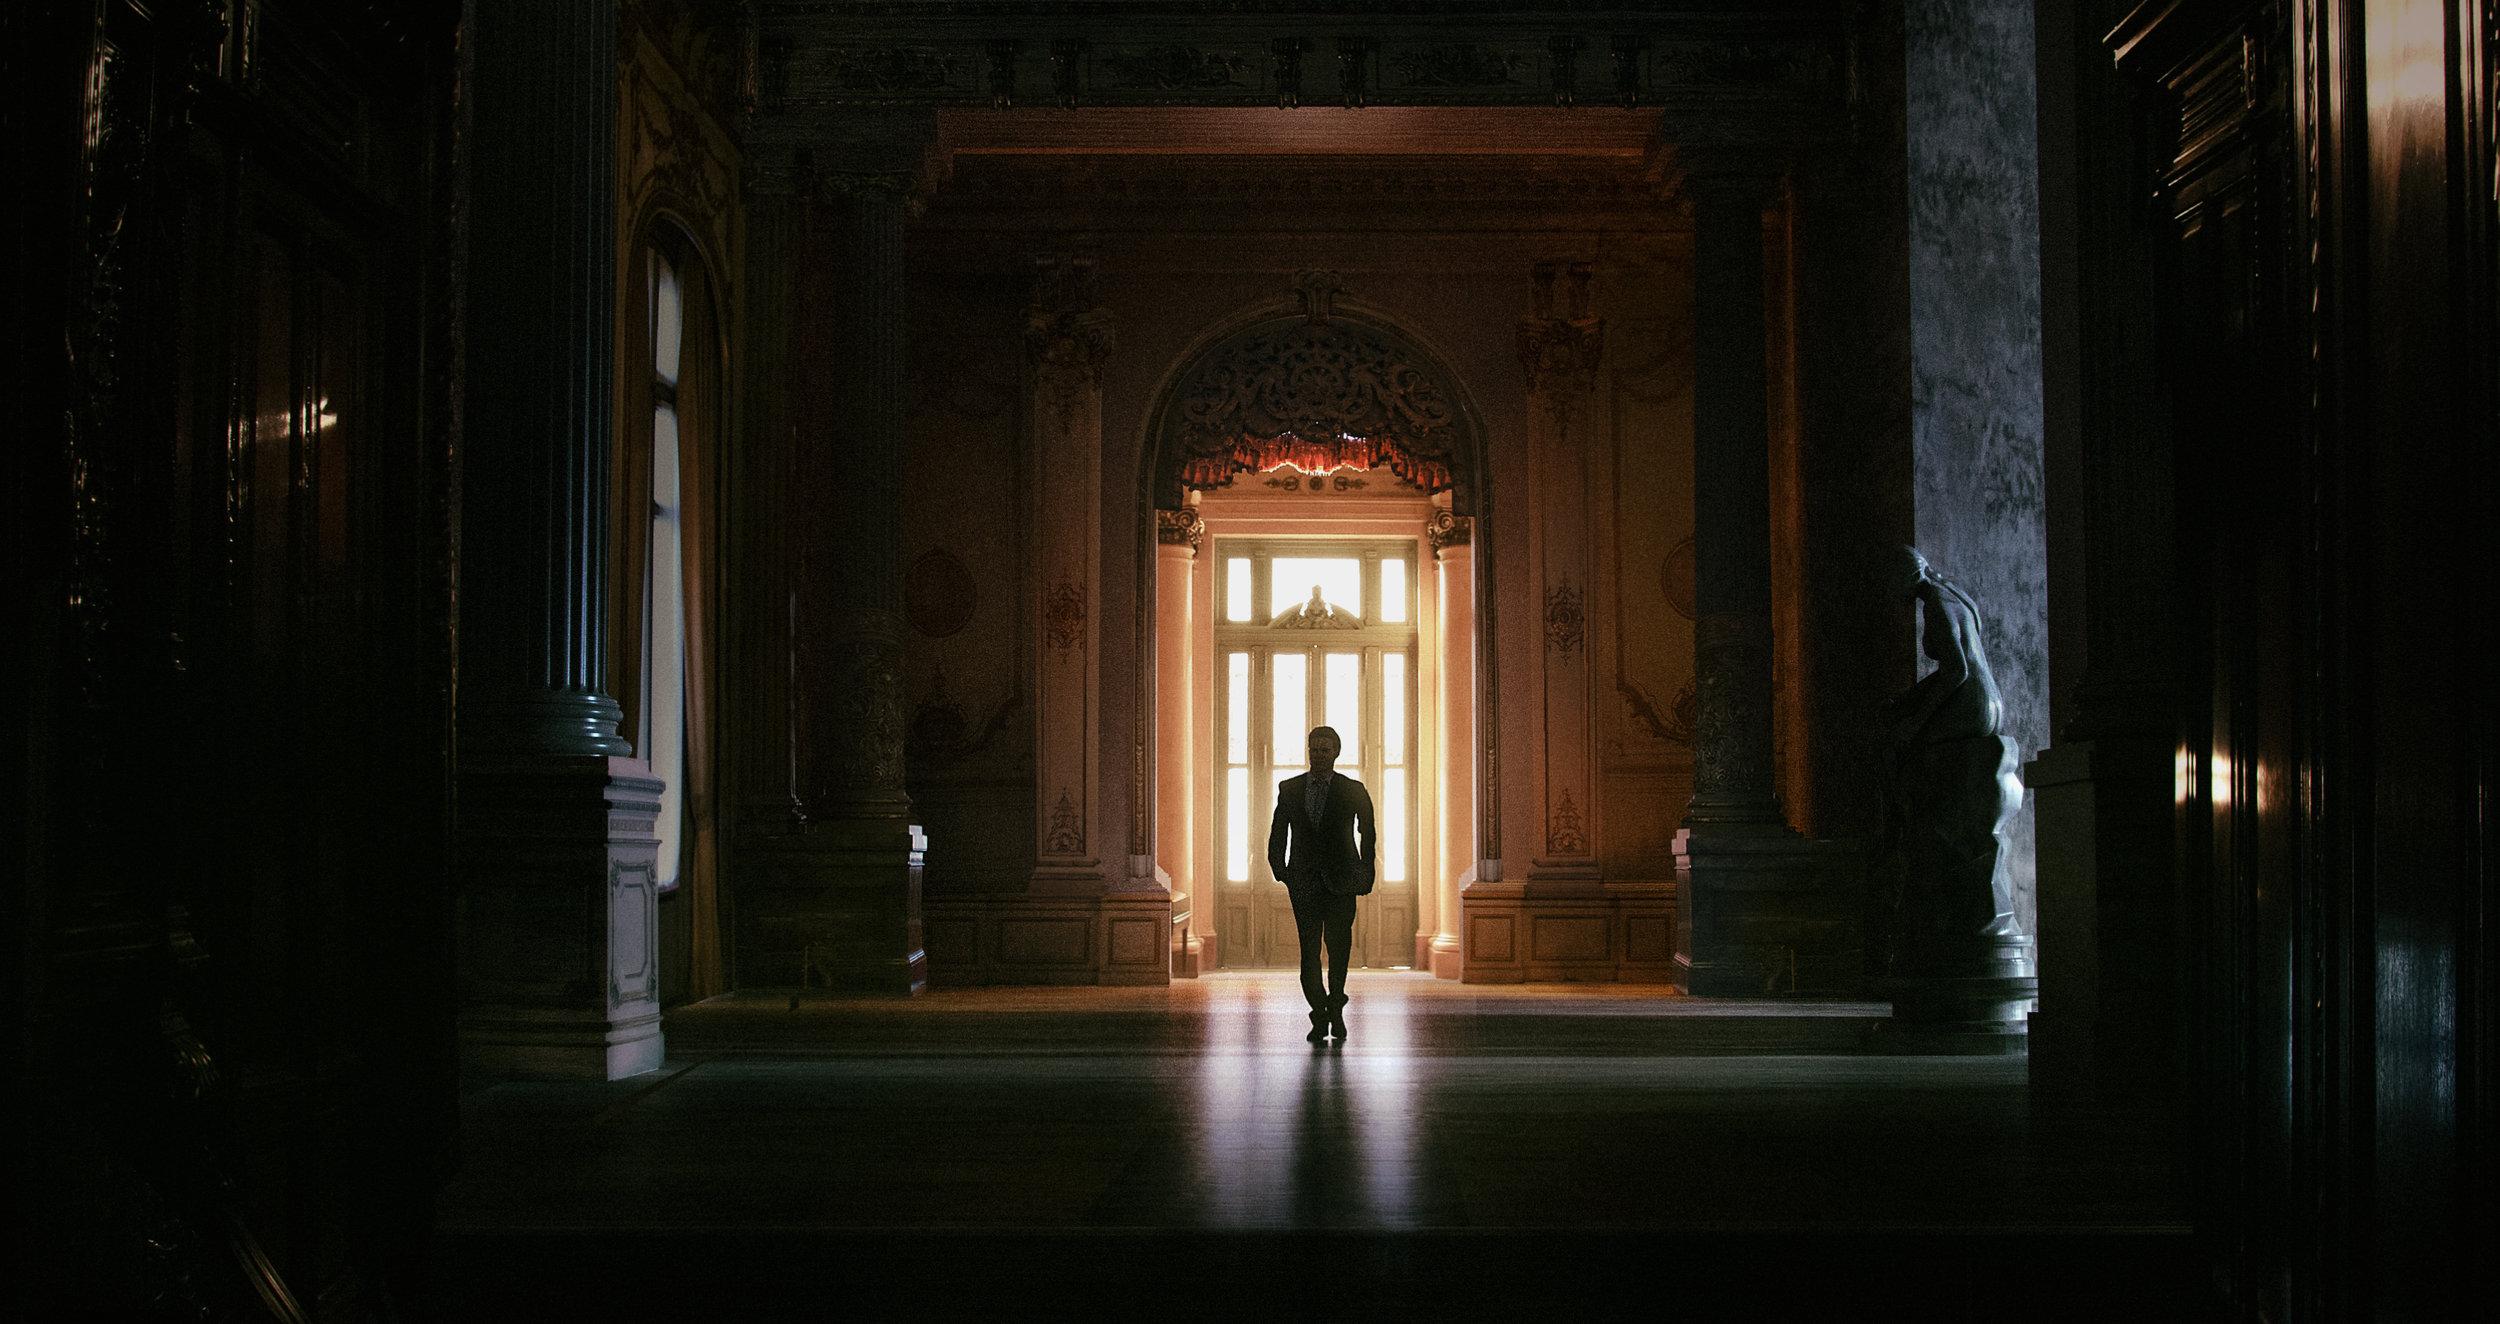 Martin_Faragasso_Cinematic.jpg